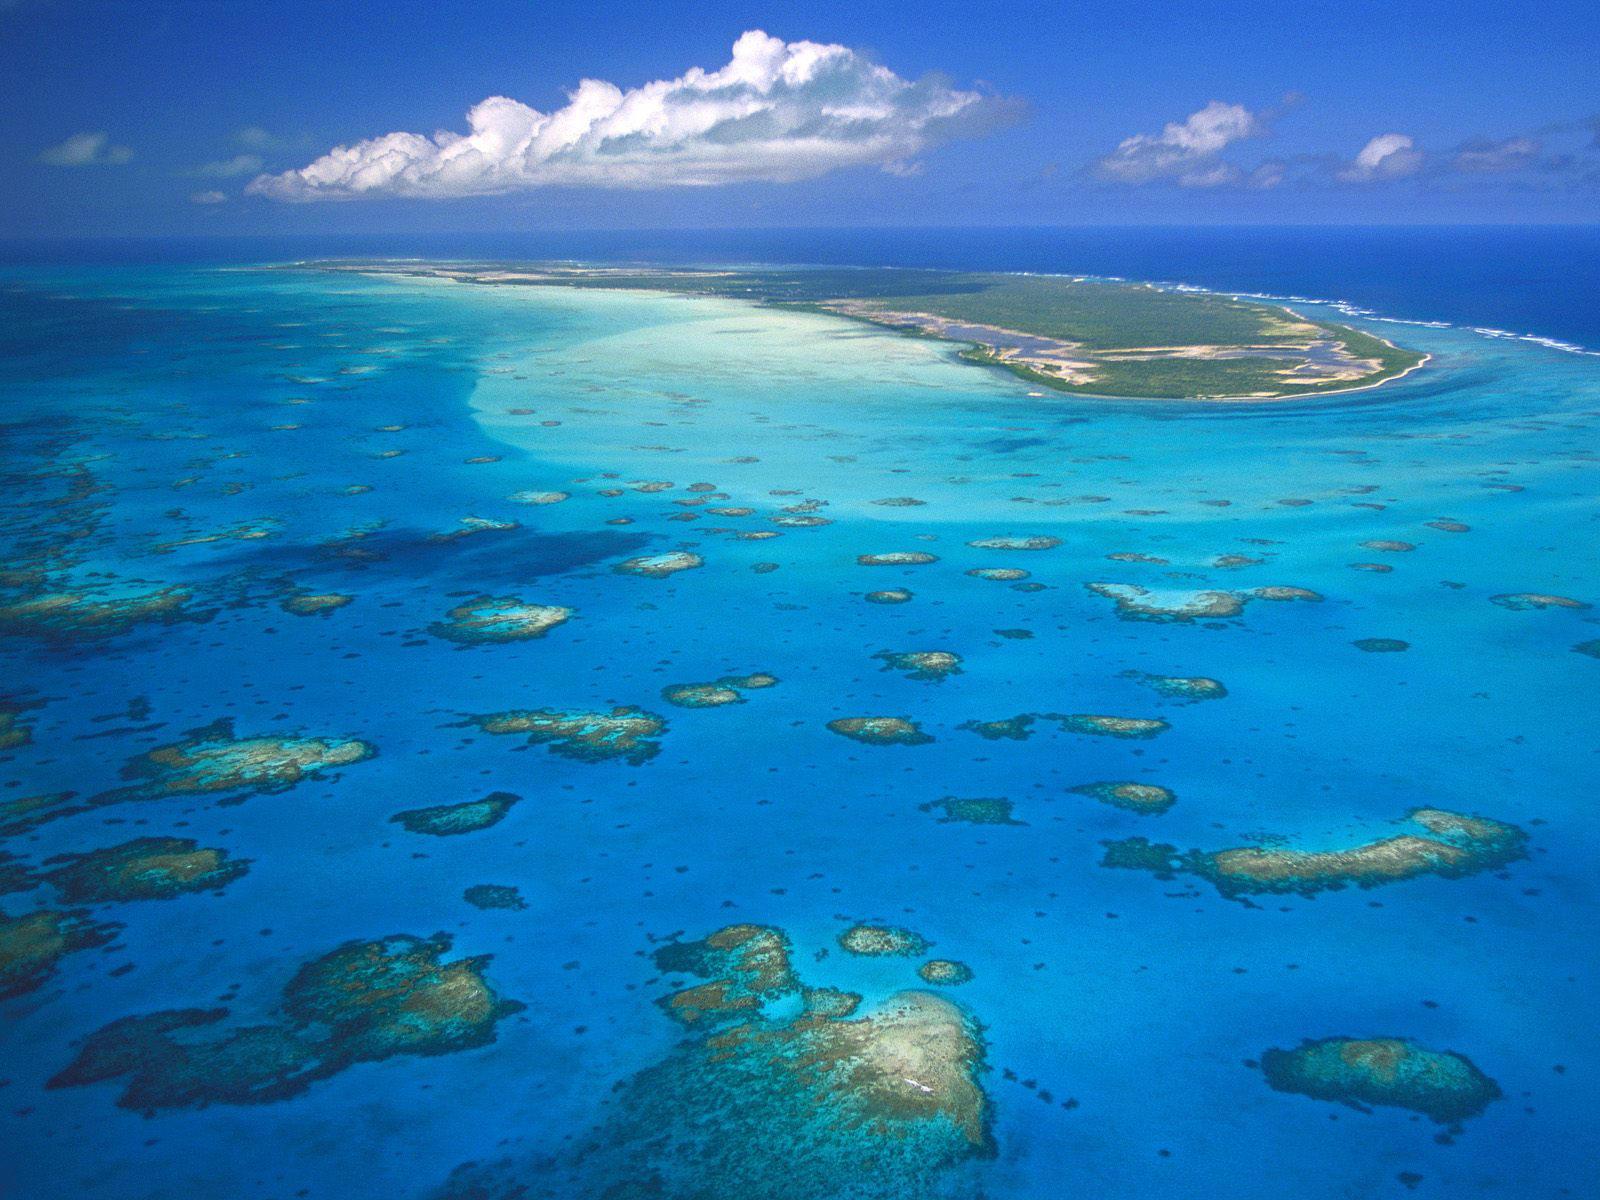 anegada-british-virgin-islands-tsunamis